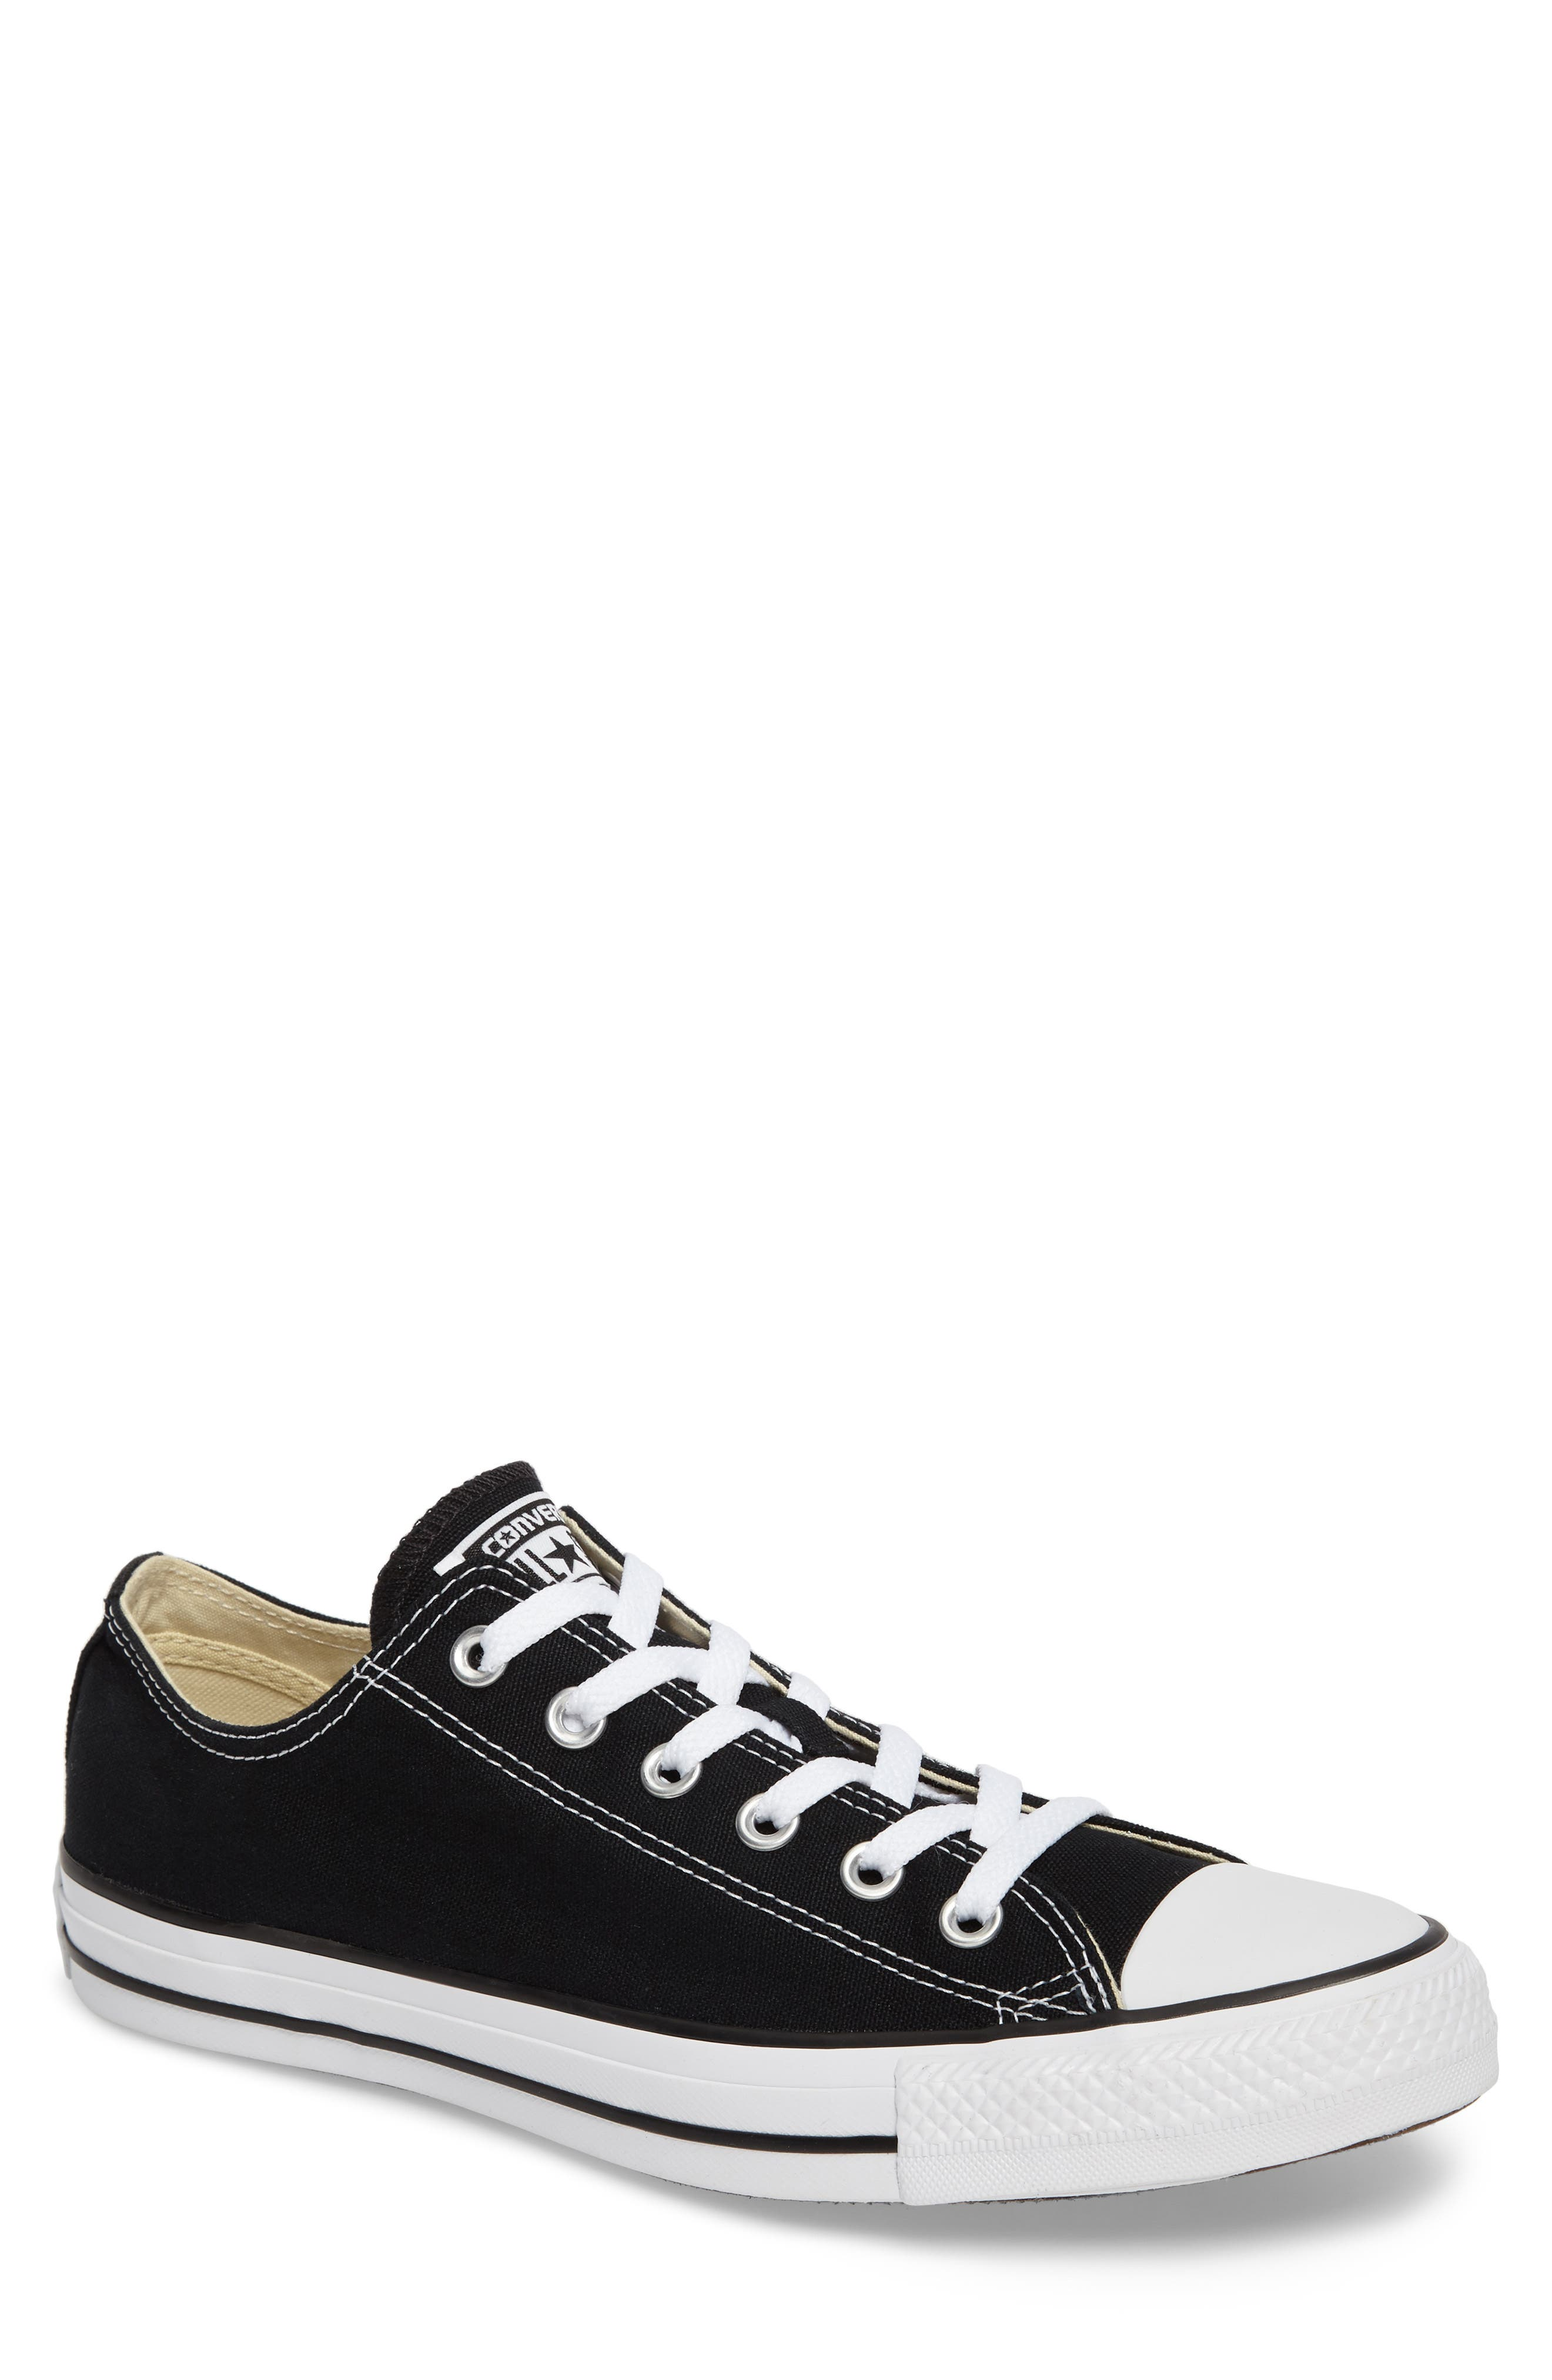 CONVERSE, Chuck Taylor<sup>®</sup> Low Sneaker, Main thumbnail 1, color, BLACK